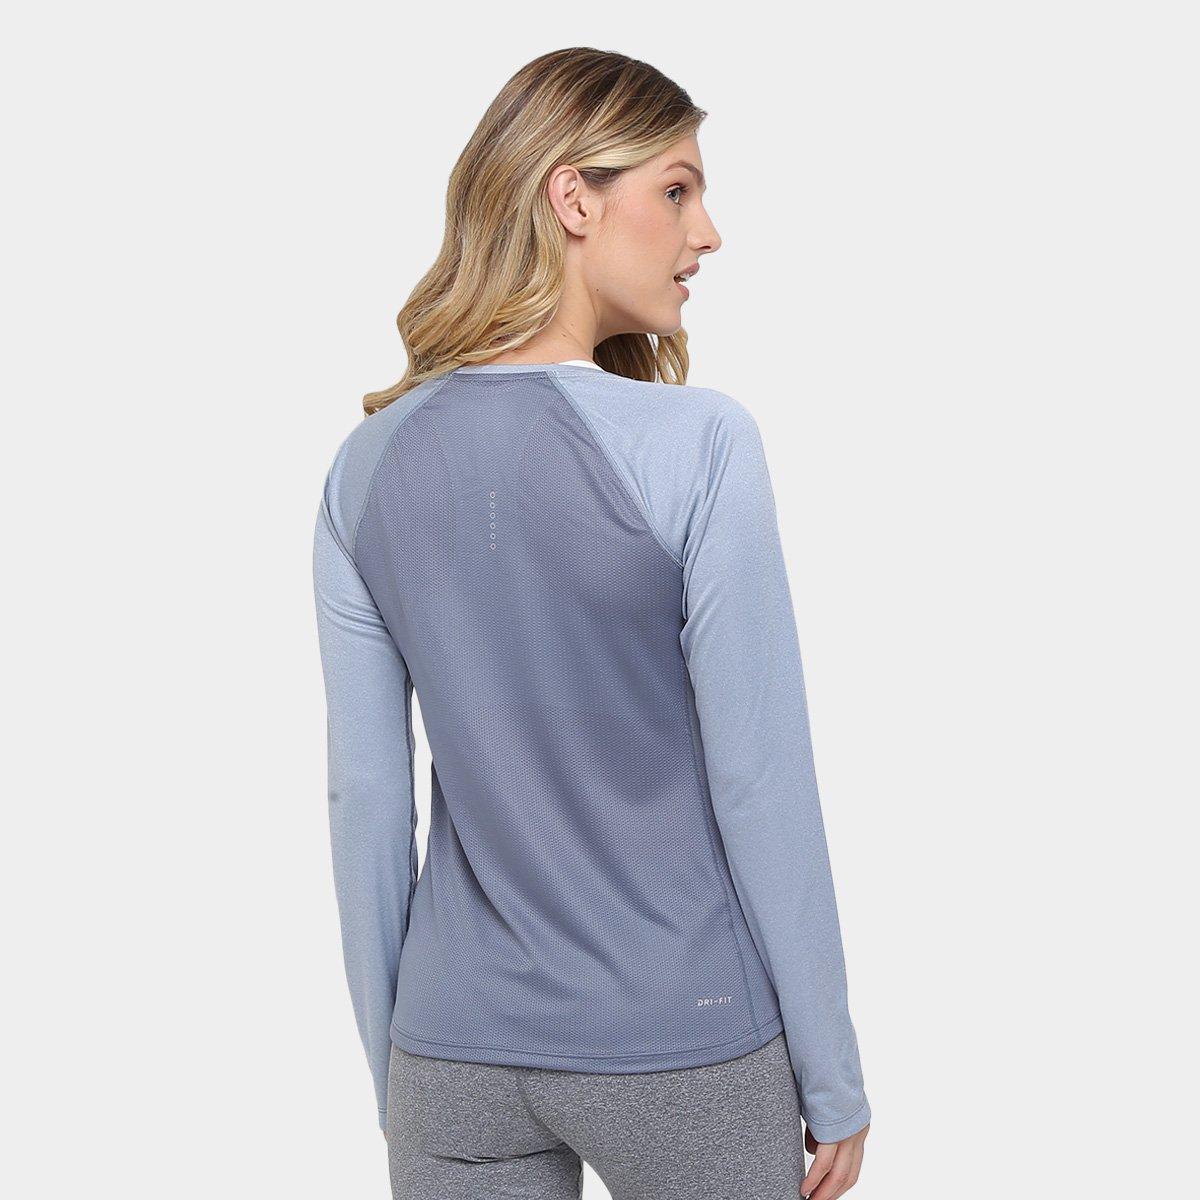 f3aca7b395 Camiseta Nike Dri-Fit Miler Top Manga Longa Feminina - Compre Agora ...